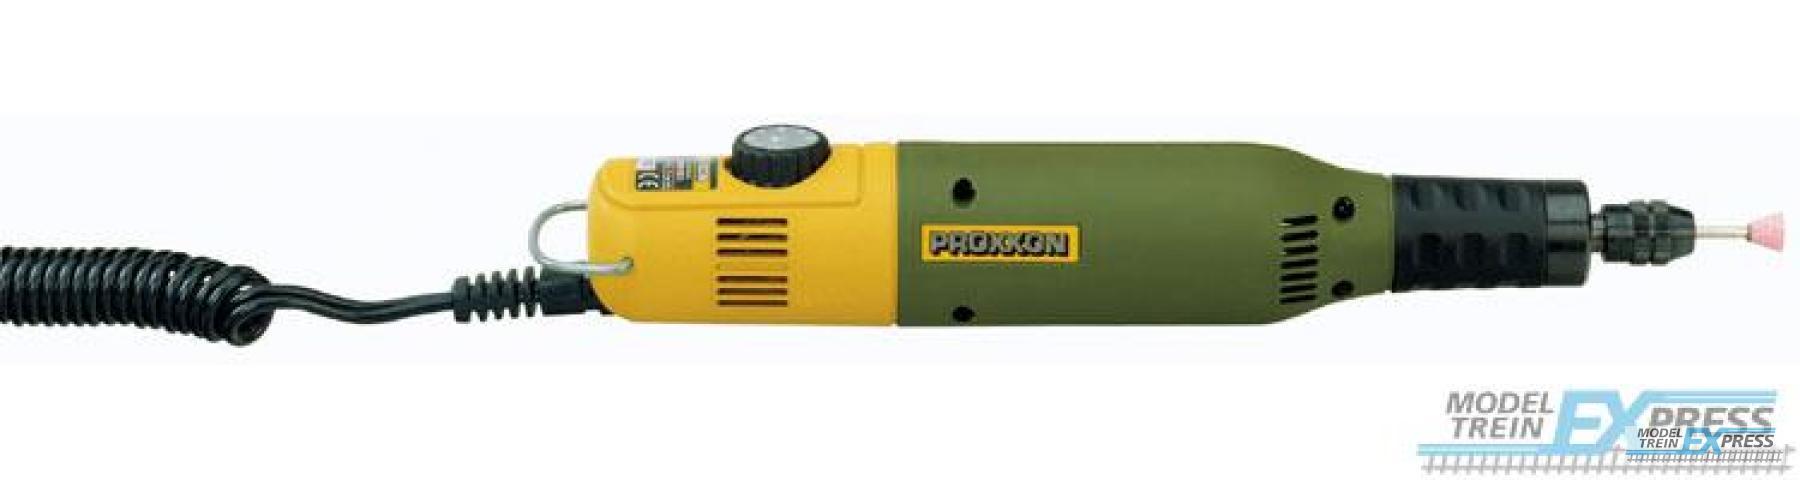 Proxxon 28510